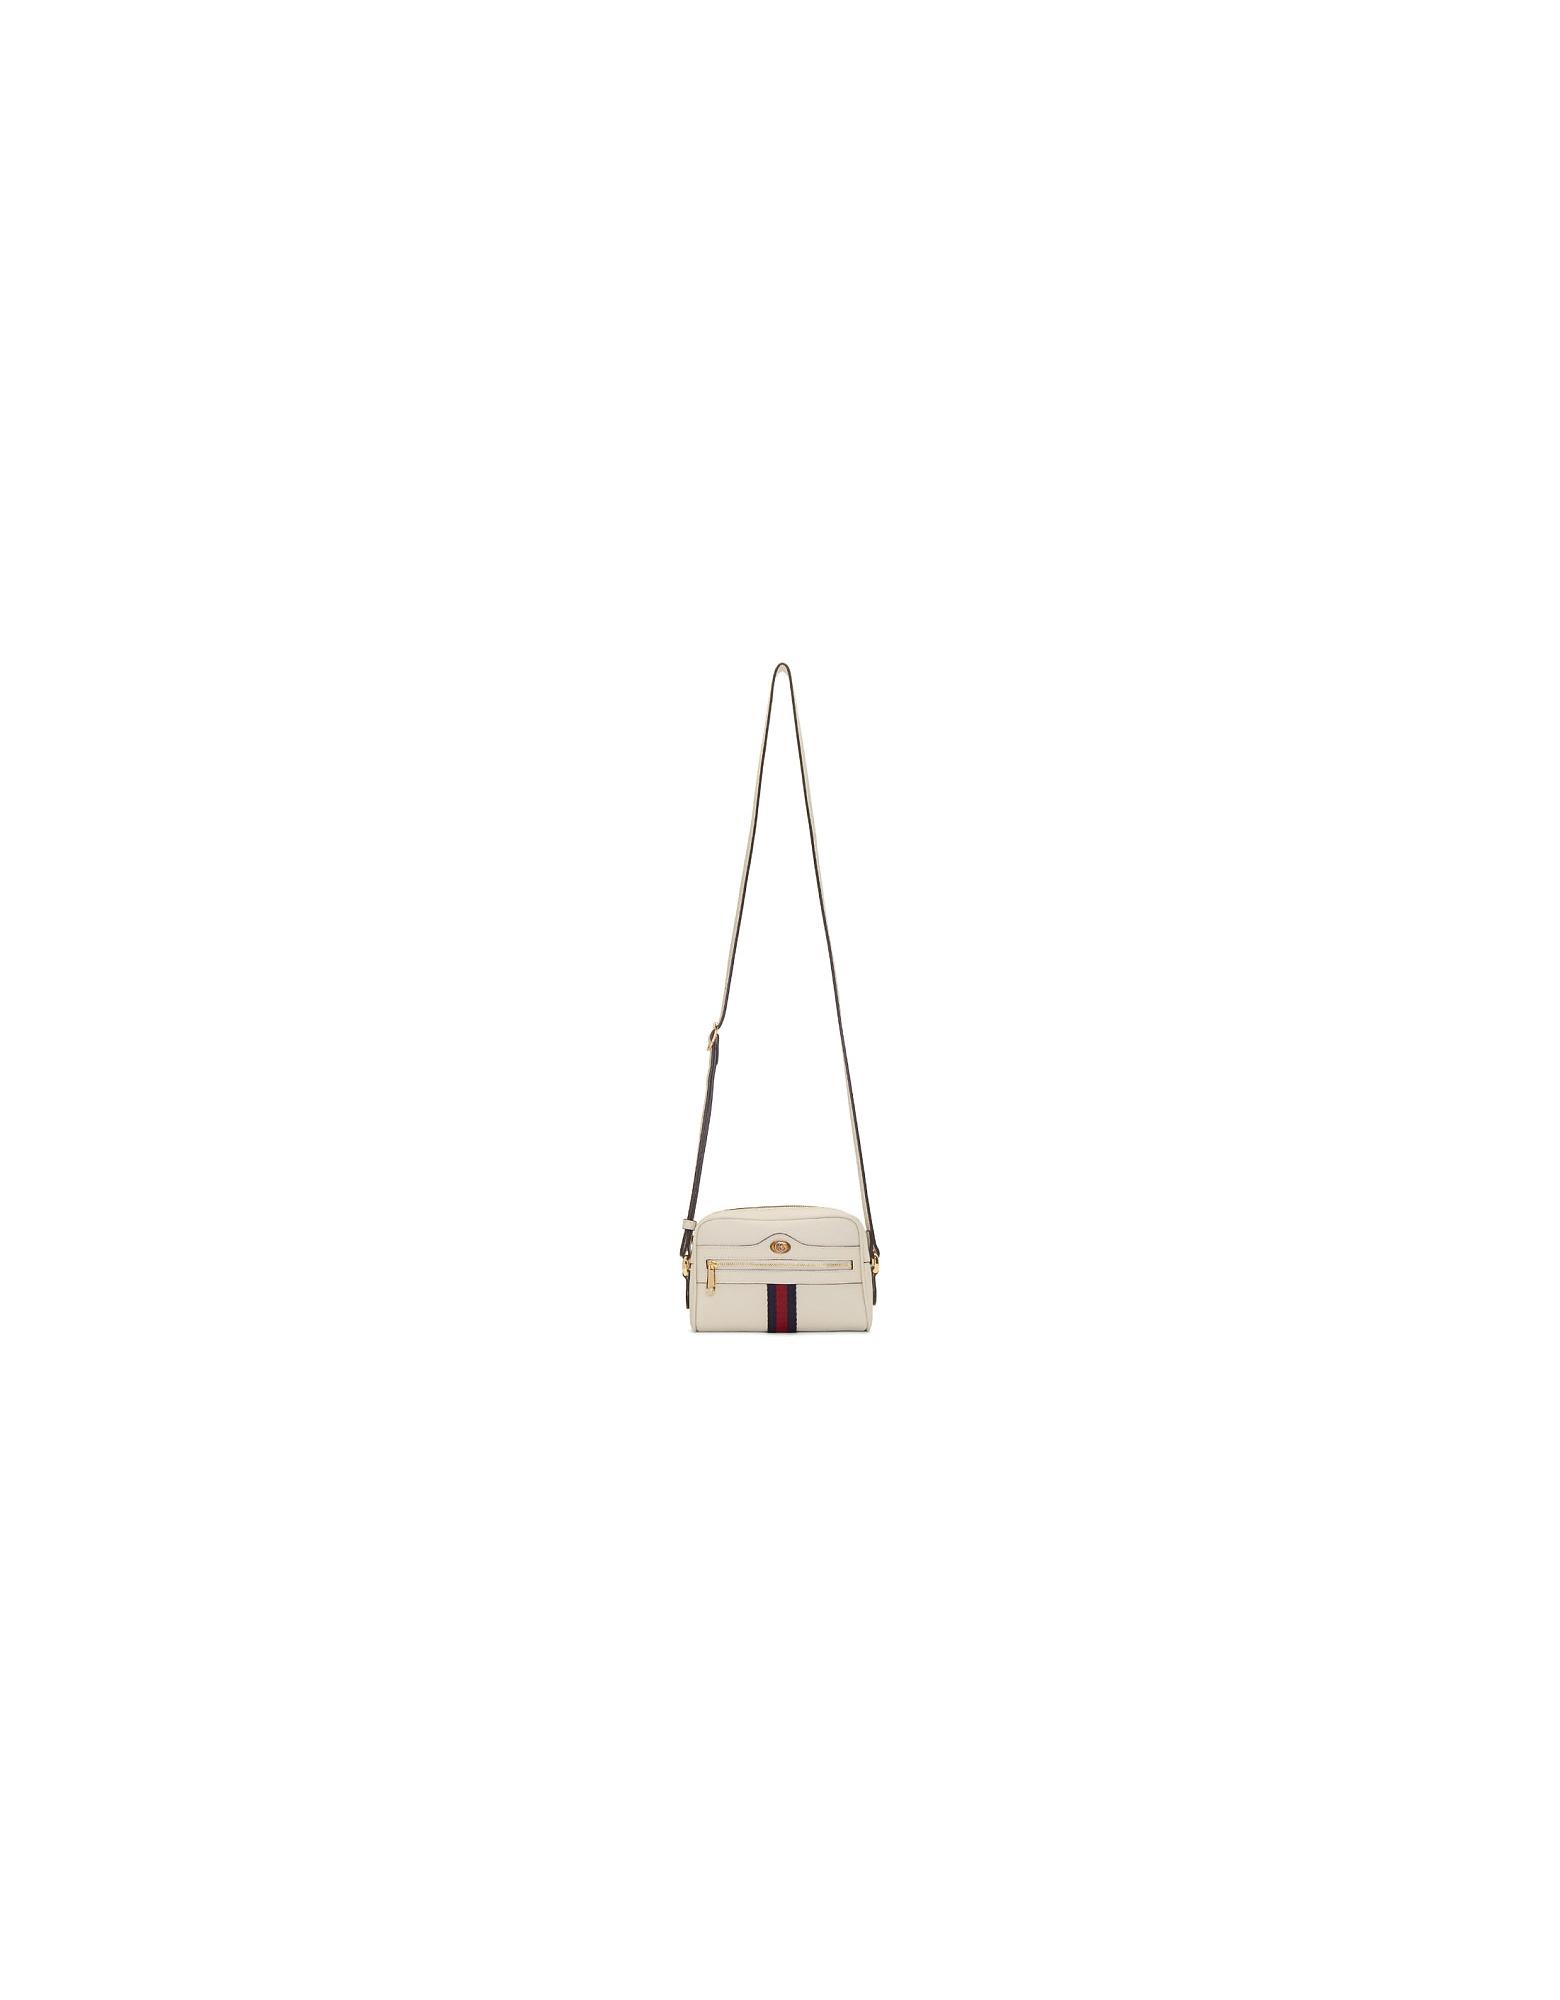 Gucci Designer Handbags, White Mini Ophidia Bag